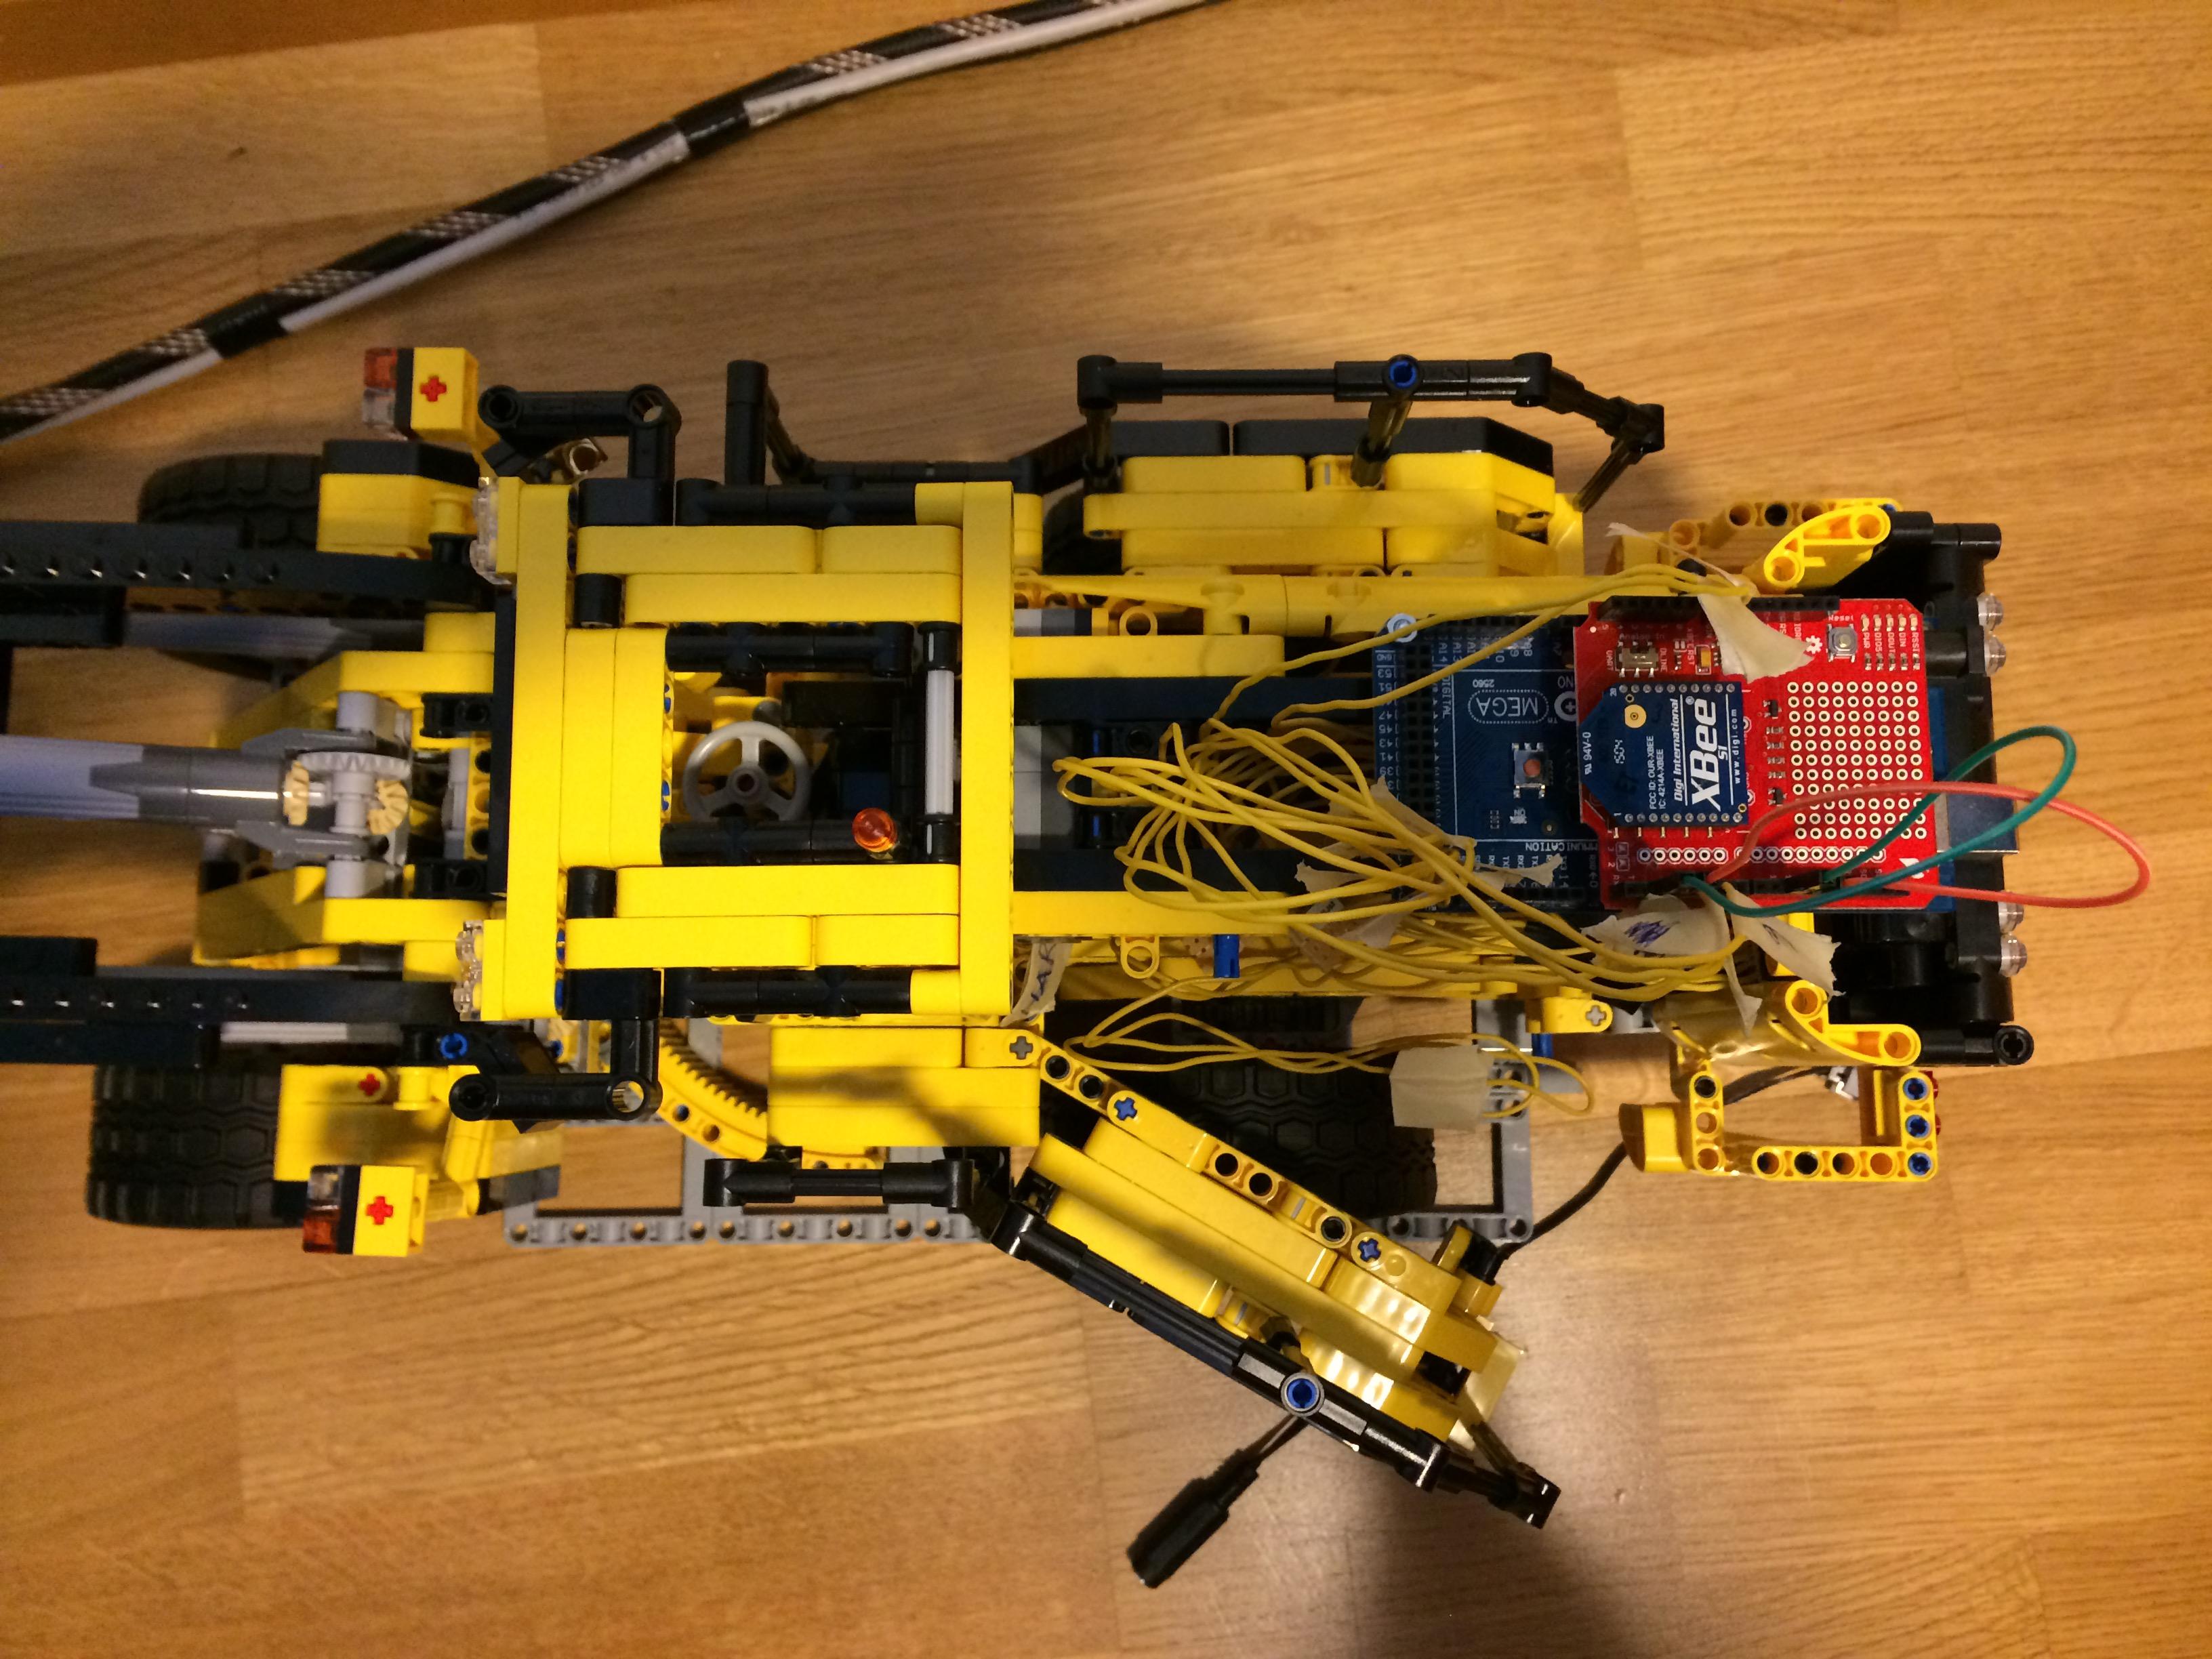 Technic lego arduino xbee